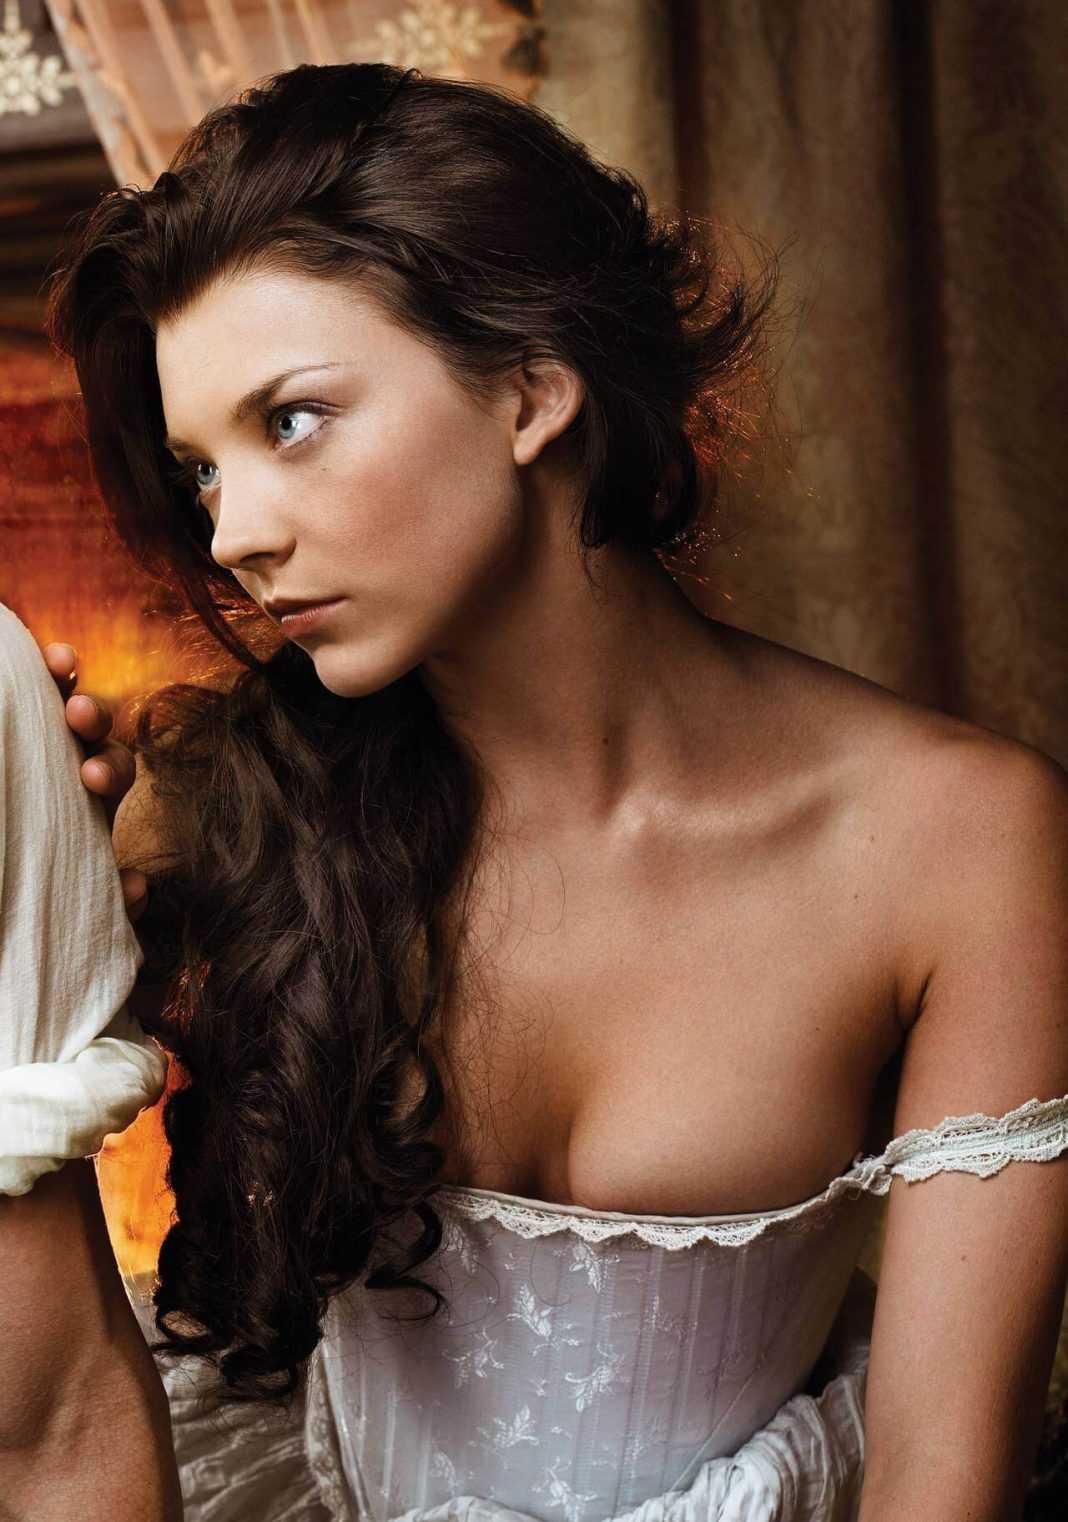 Natalie Dormer hot cleavage